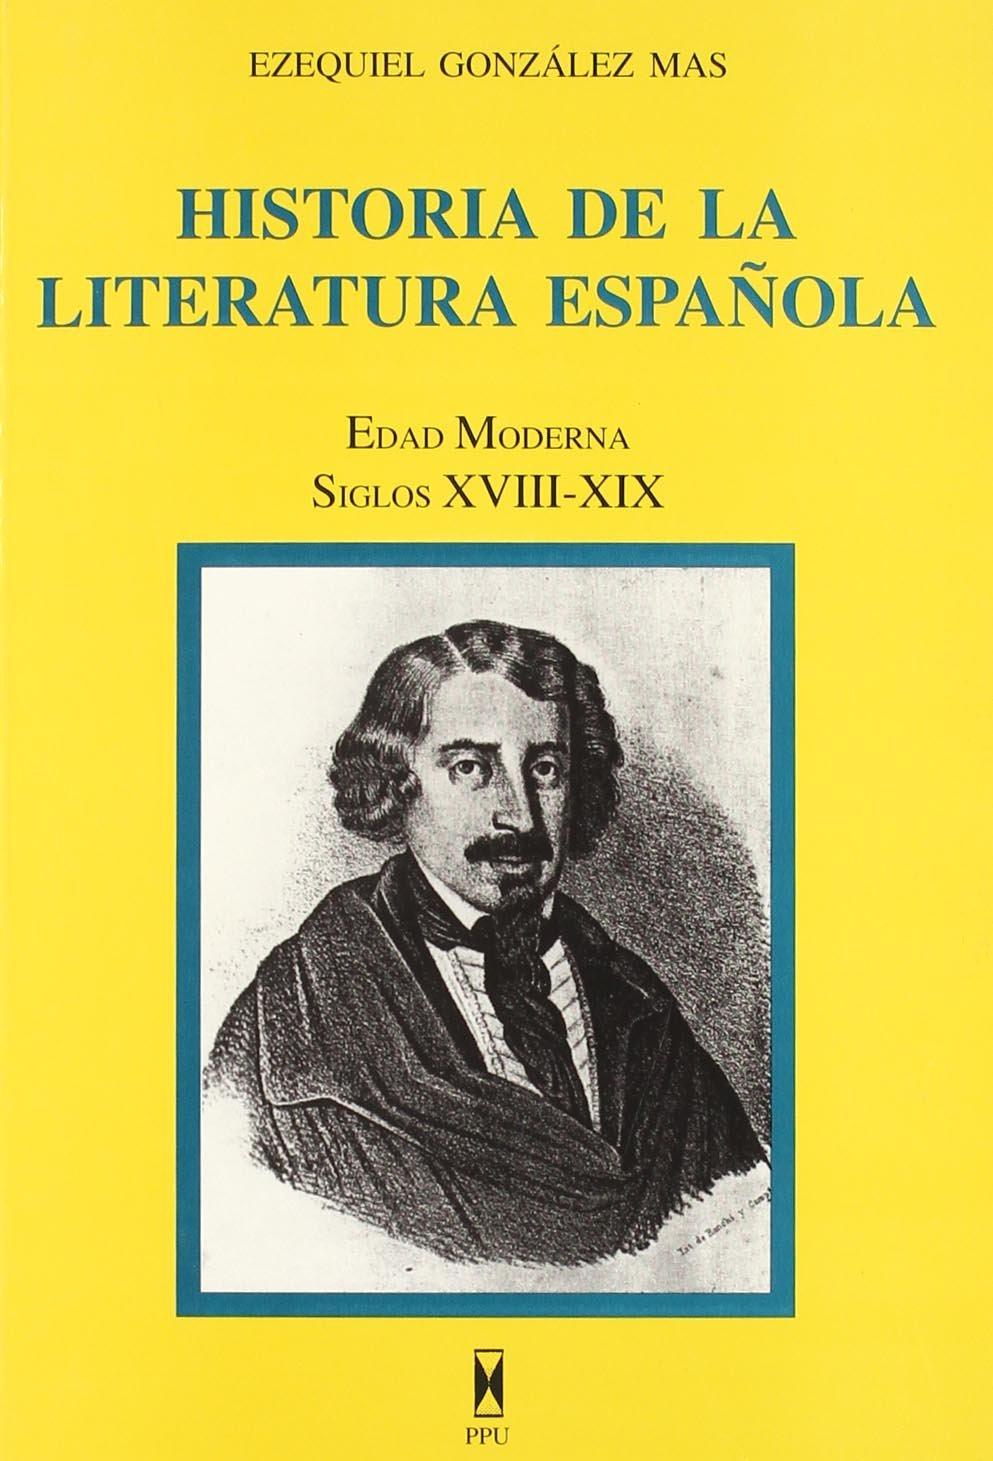 HA.LITERATURA ESPAÑOLA EDAD MODERNA S.XVIII-XIX: Amazon.es: González Más, Ezequiel: Libros